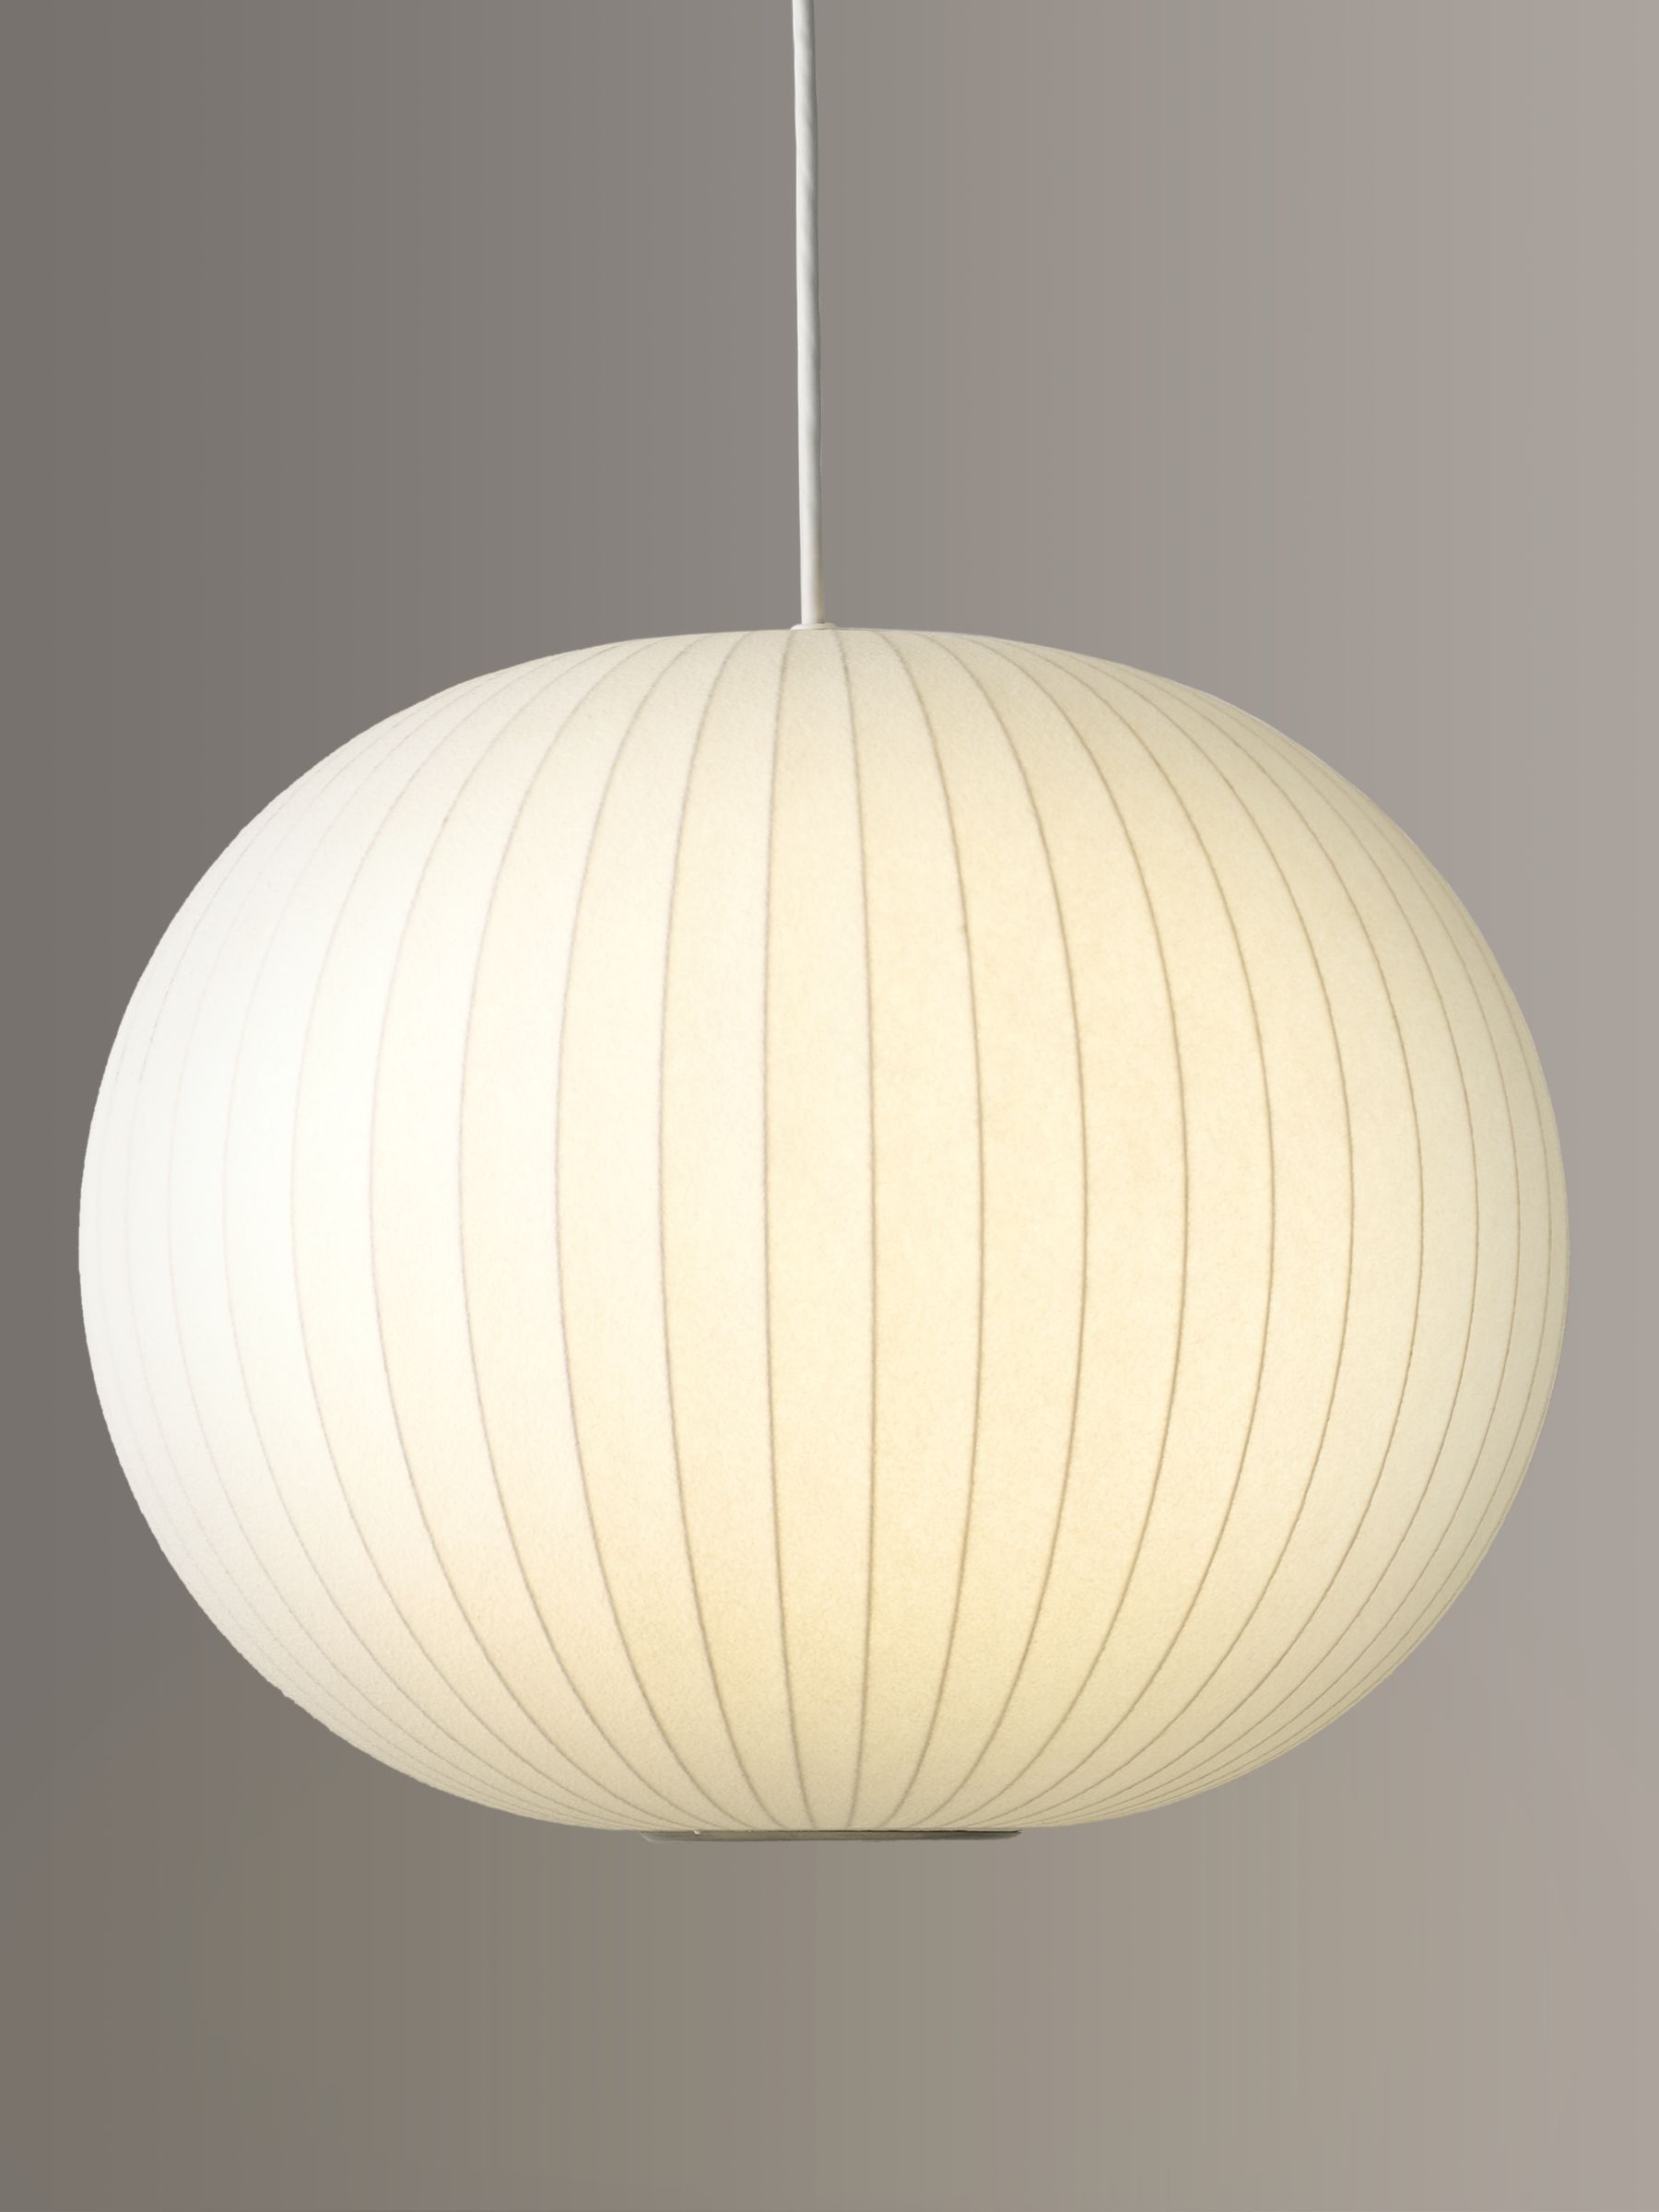 George Nelson George Nelson Bubble Ceiling Light, Medium